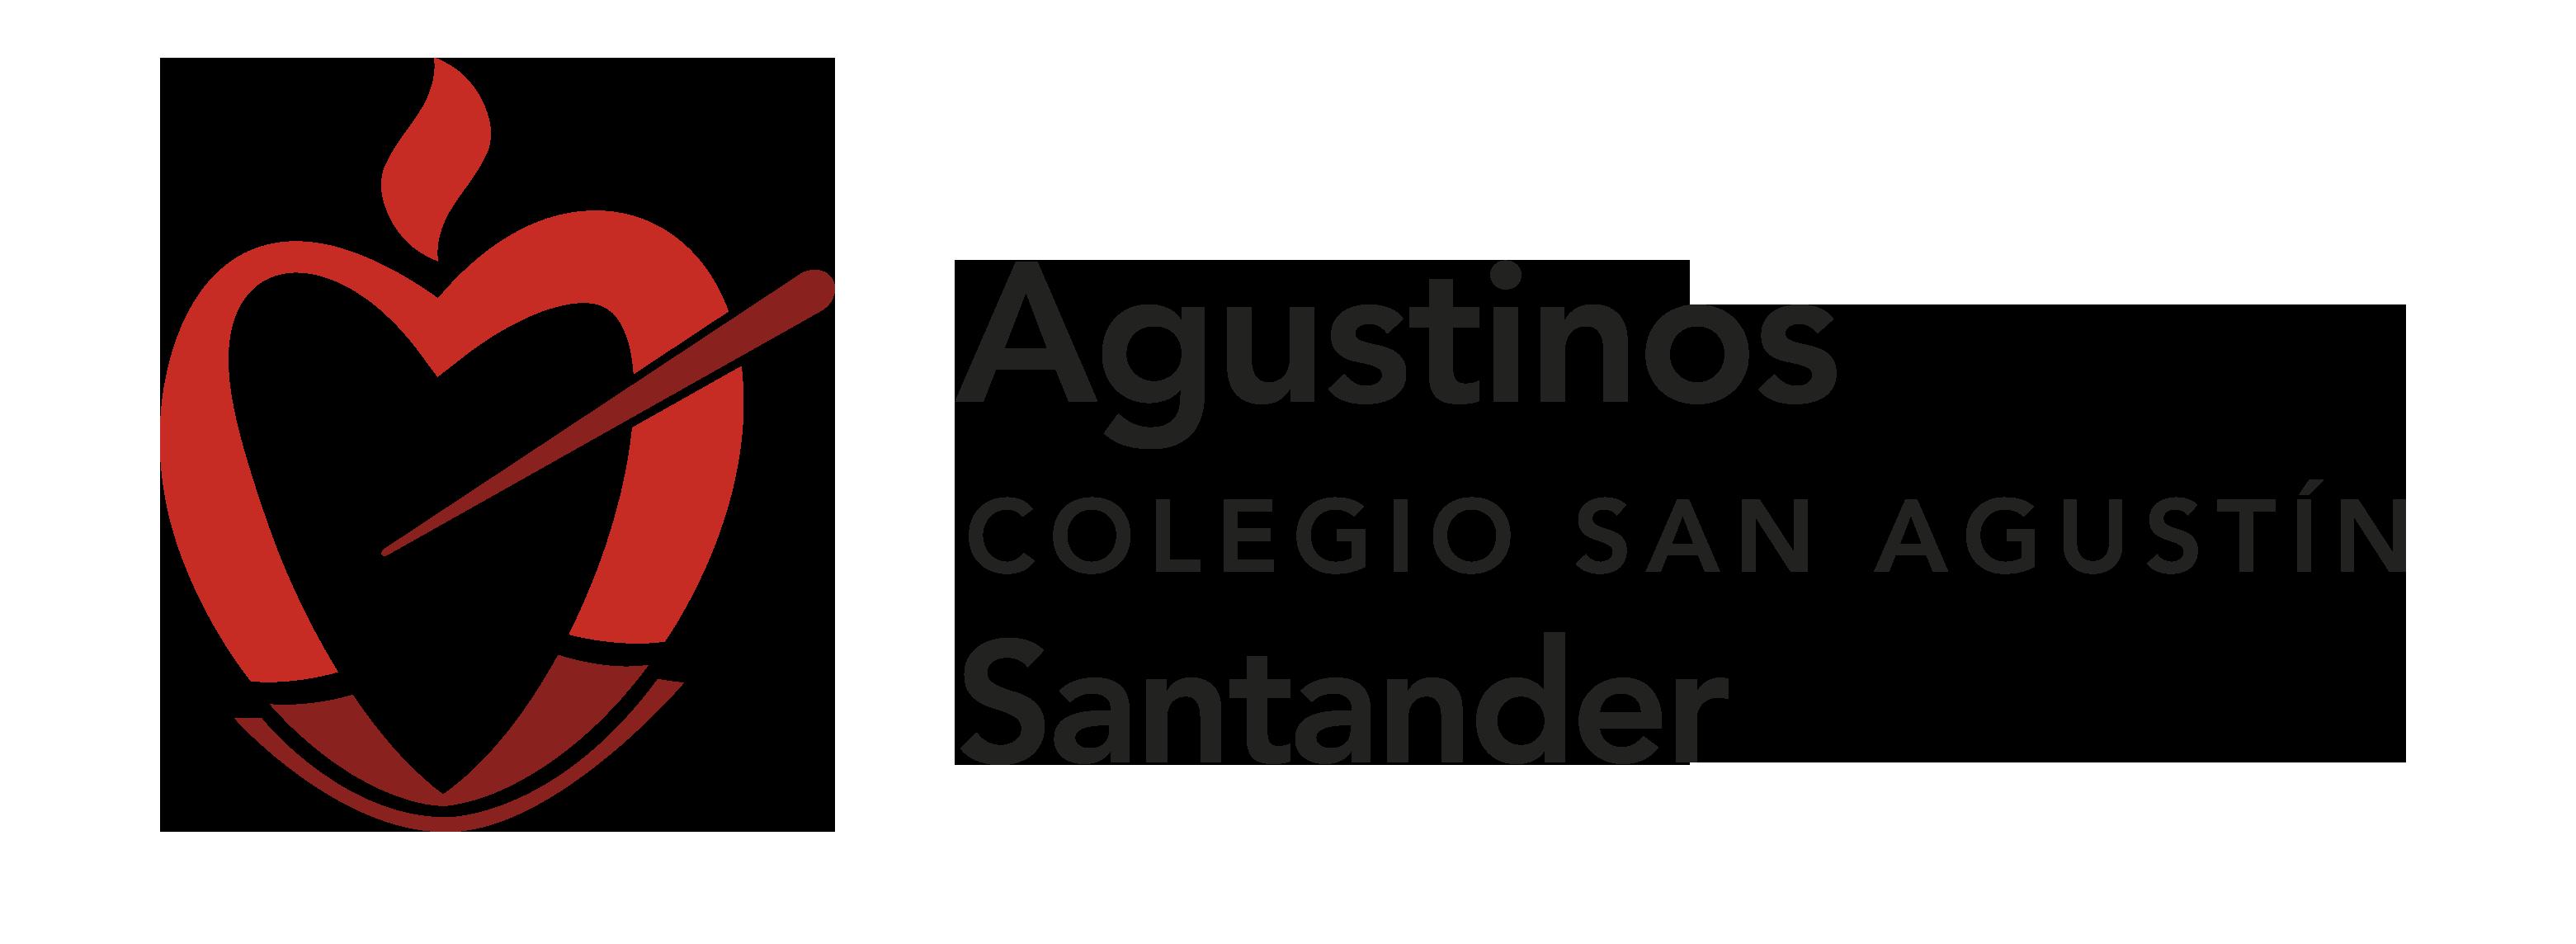 Colegio San Agustín Santander